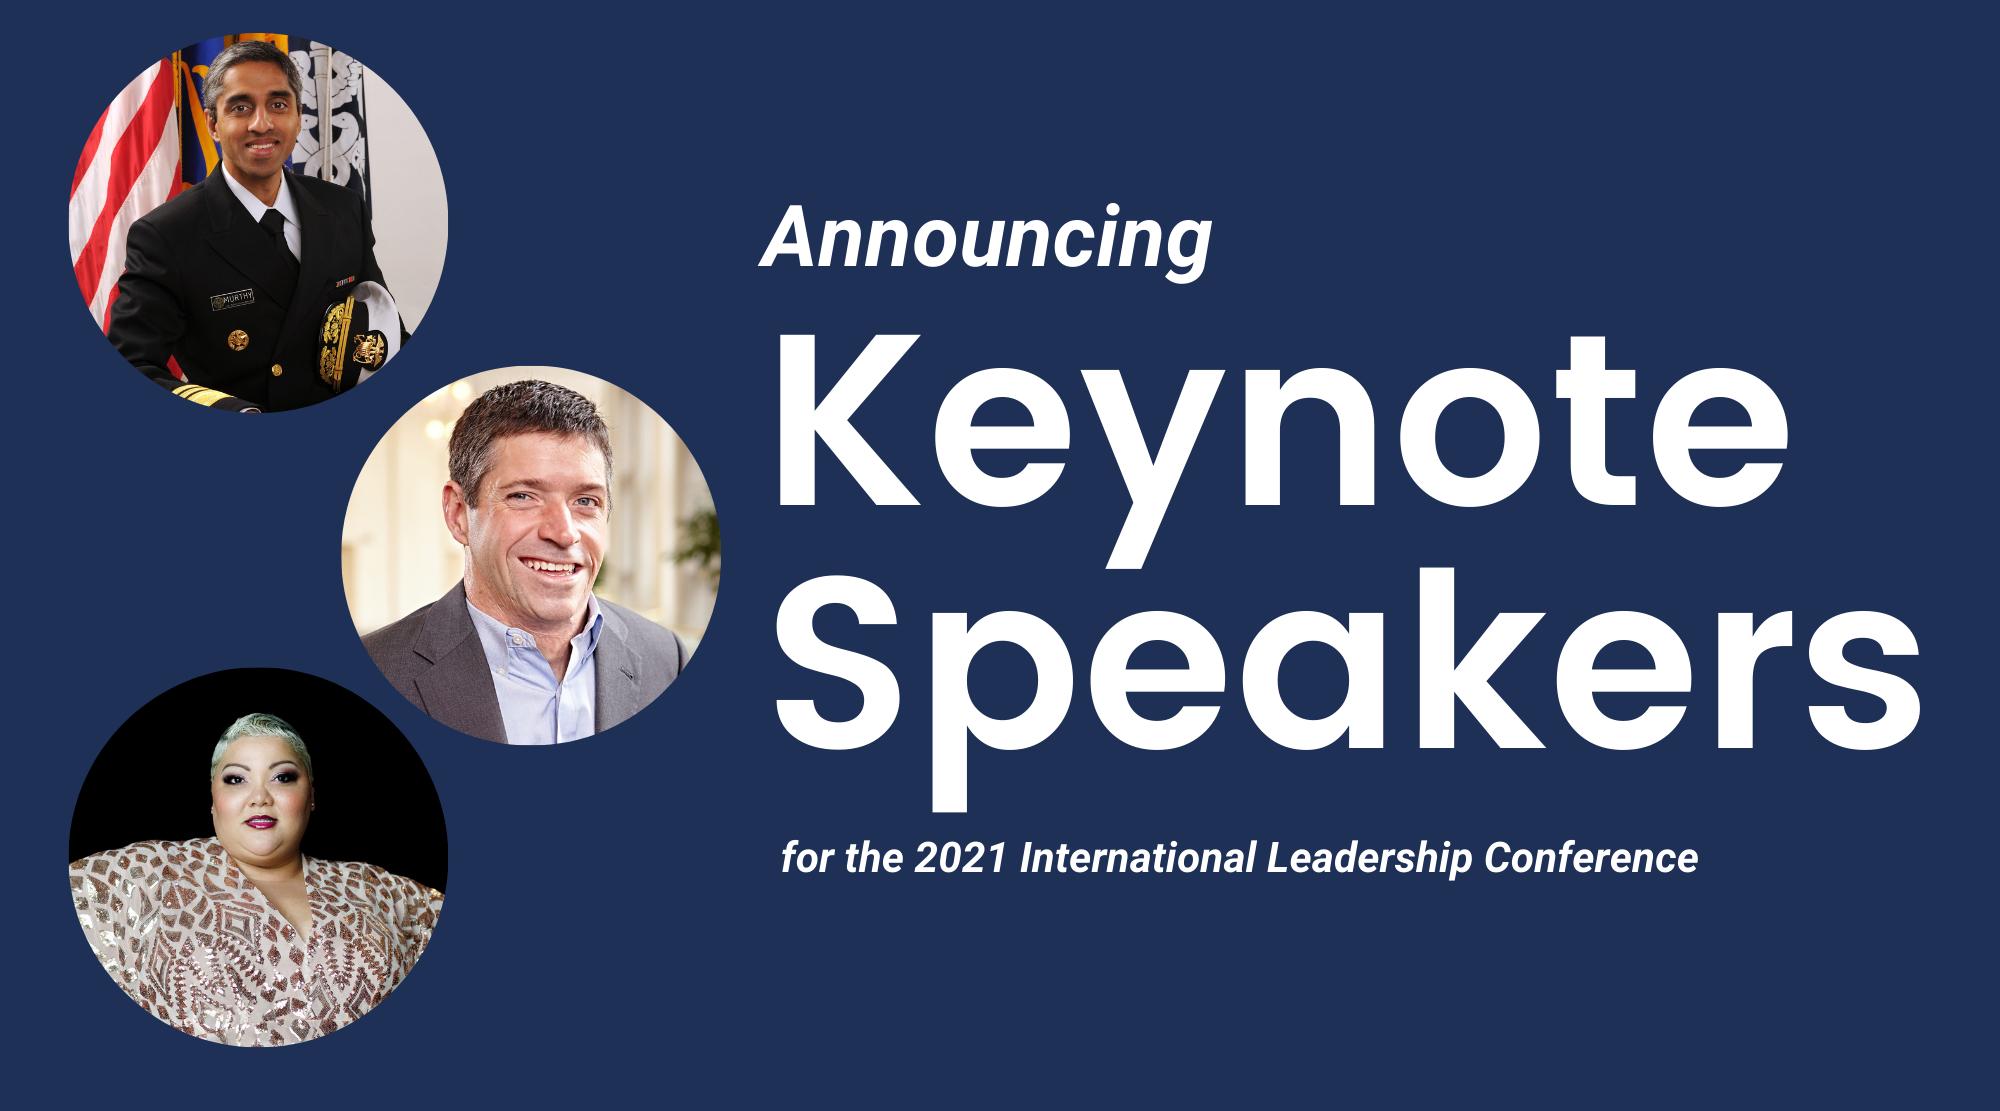 Introducing Keynote Speakers and Interactive Workshops